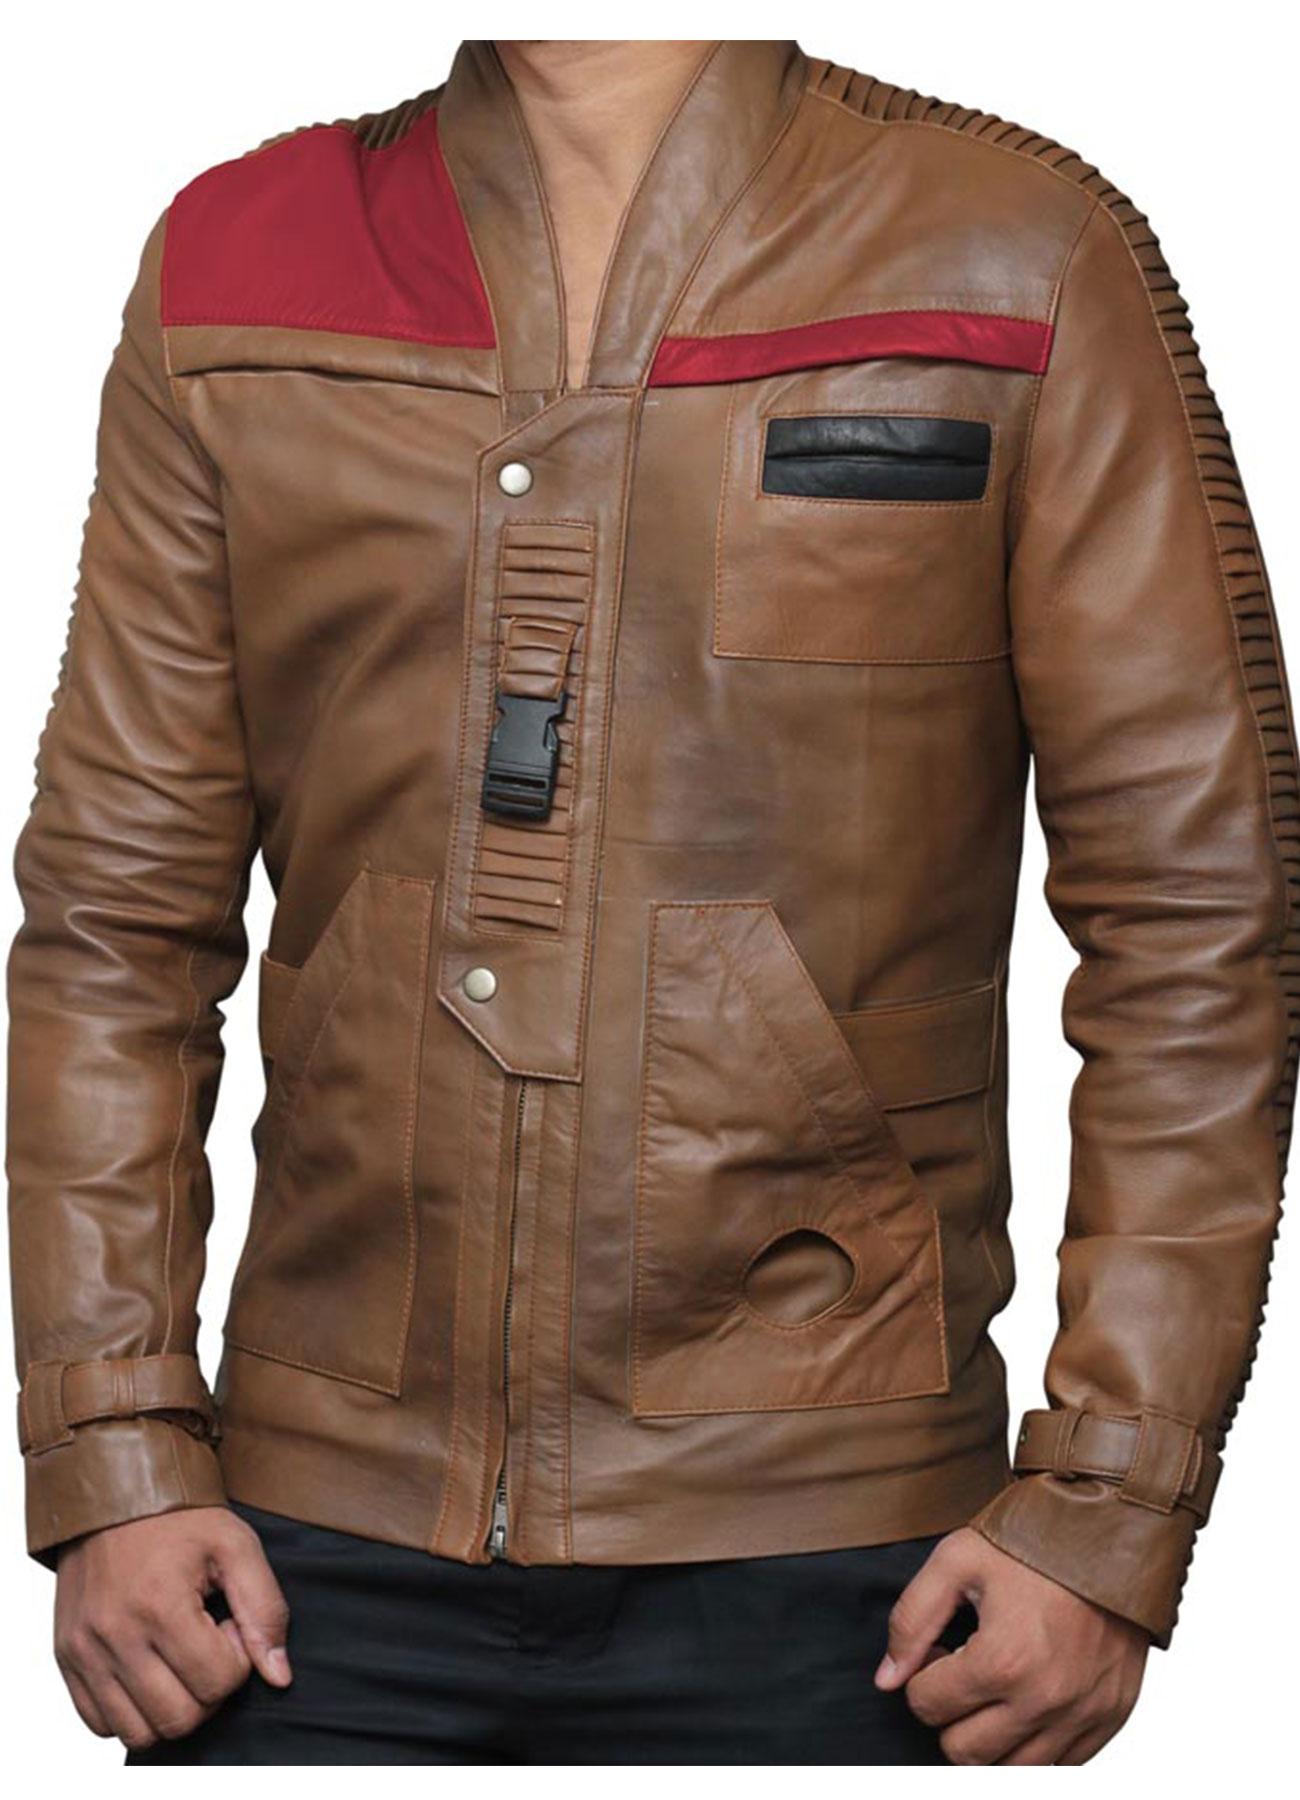 Boyega as Finn Star Wars Finn Jacket Choco Brown